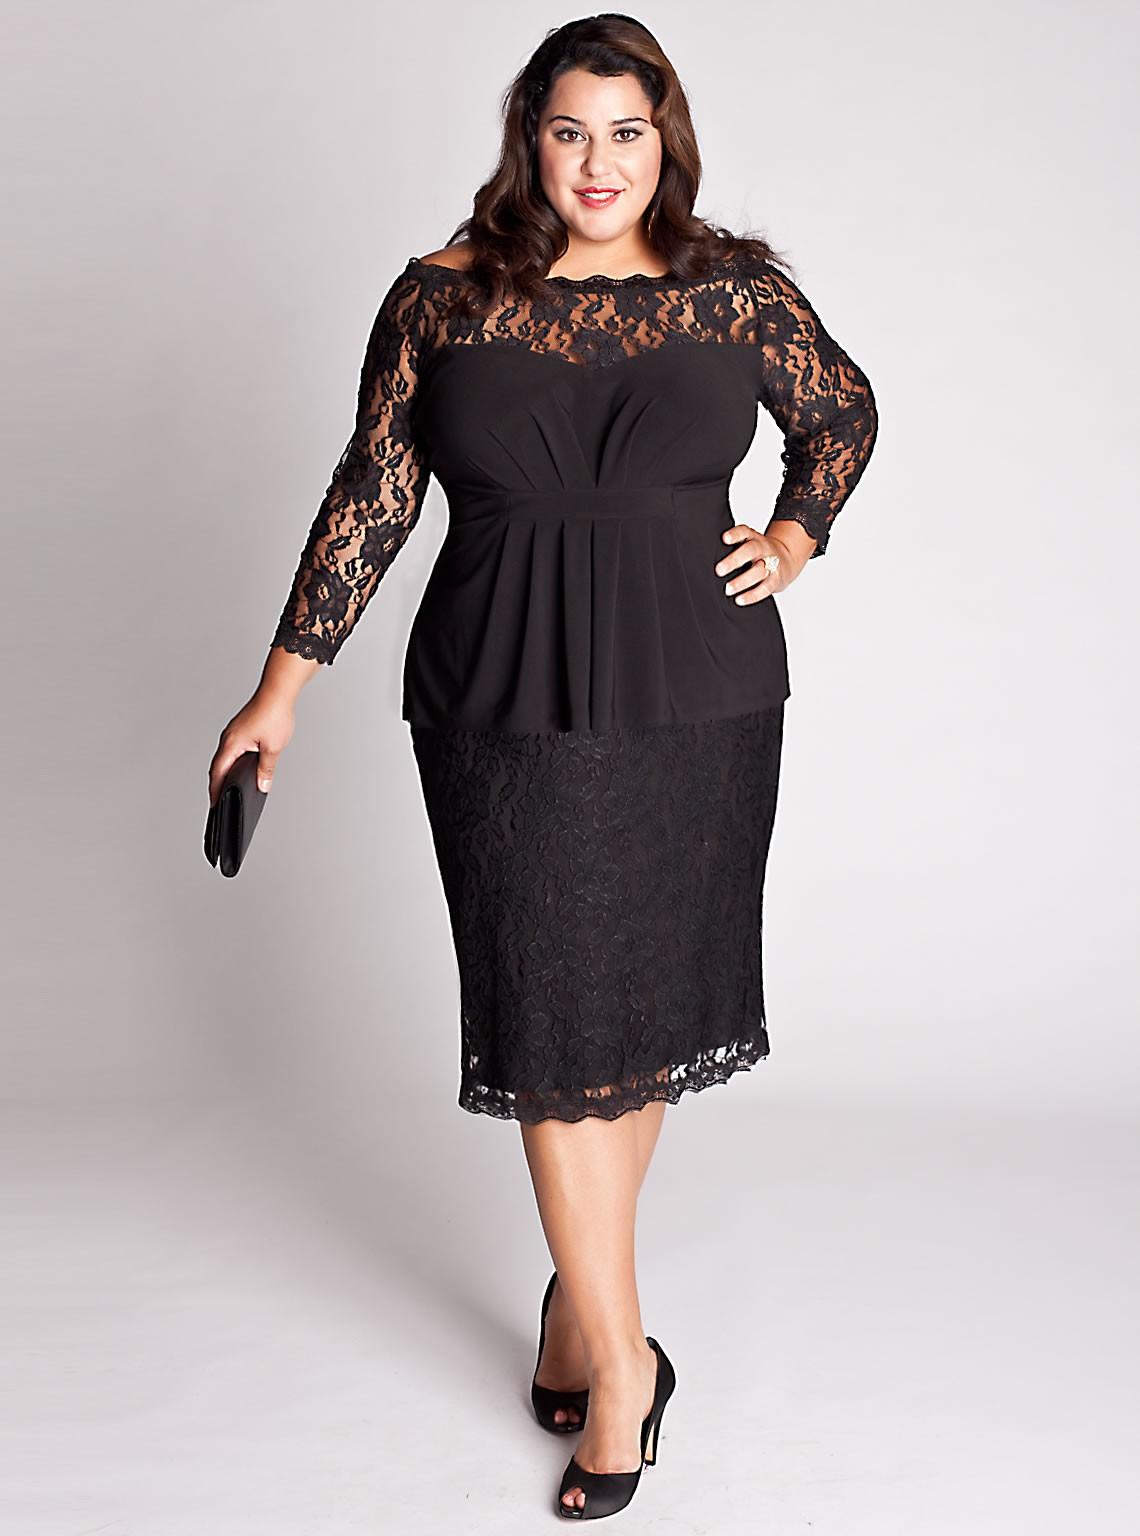 Latest Fashionable Dresses: Pick Plus Sized Dresses That ...